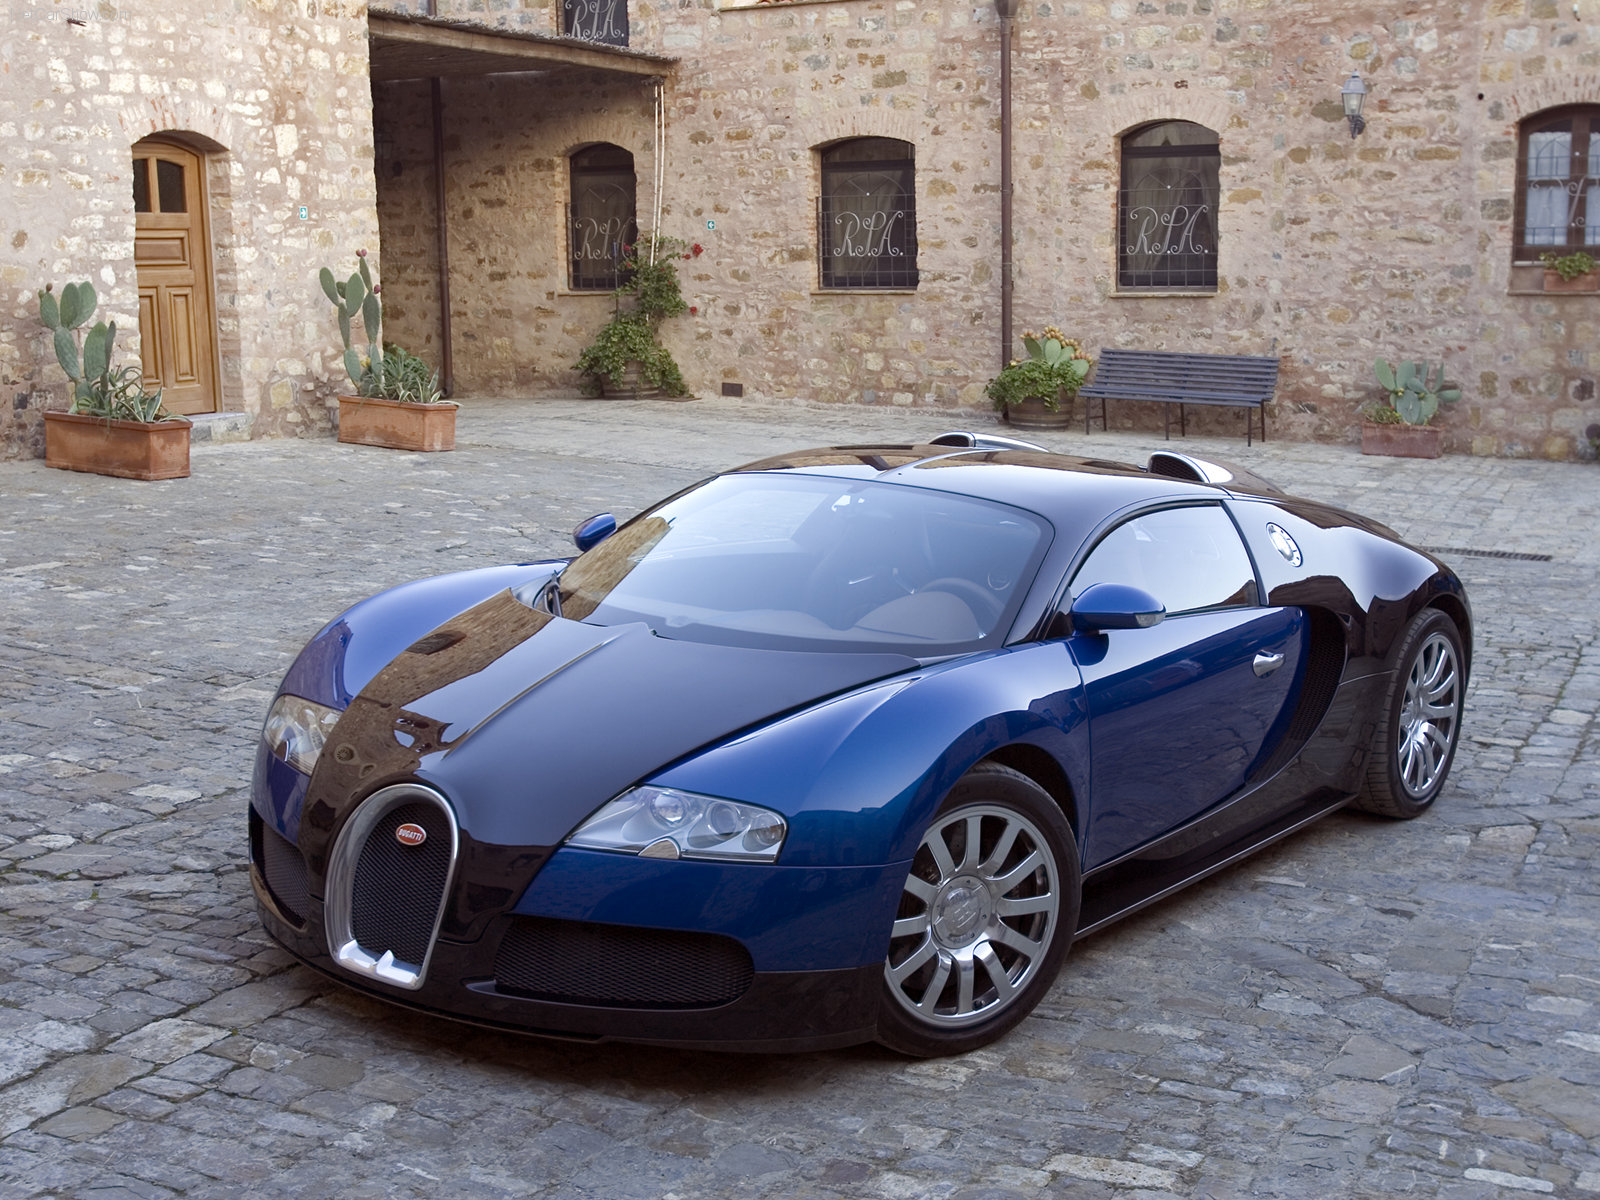 bugatti veyron wallpaper cars hd wallpapers. Black Bedroom Furniture Sets. Home Design Ideas